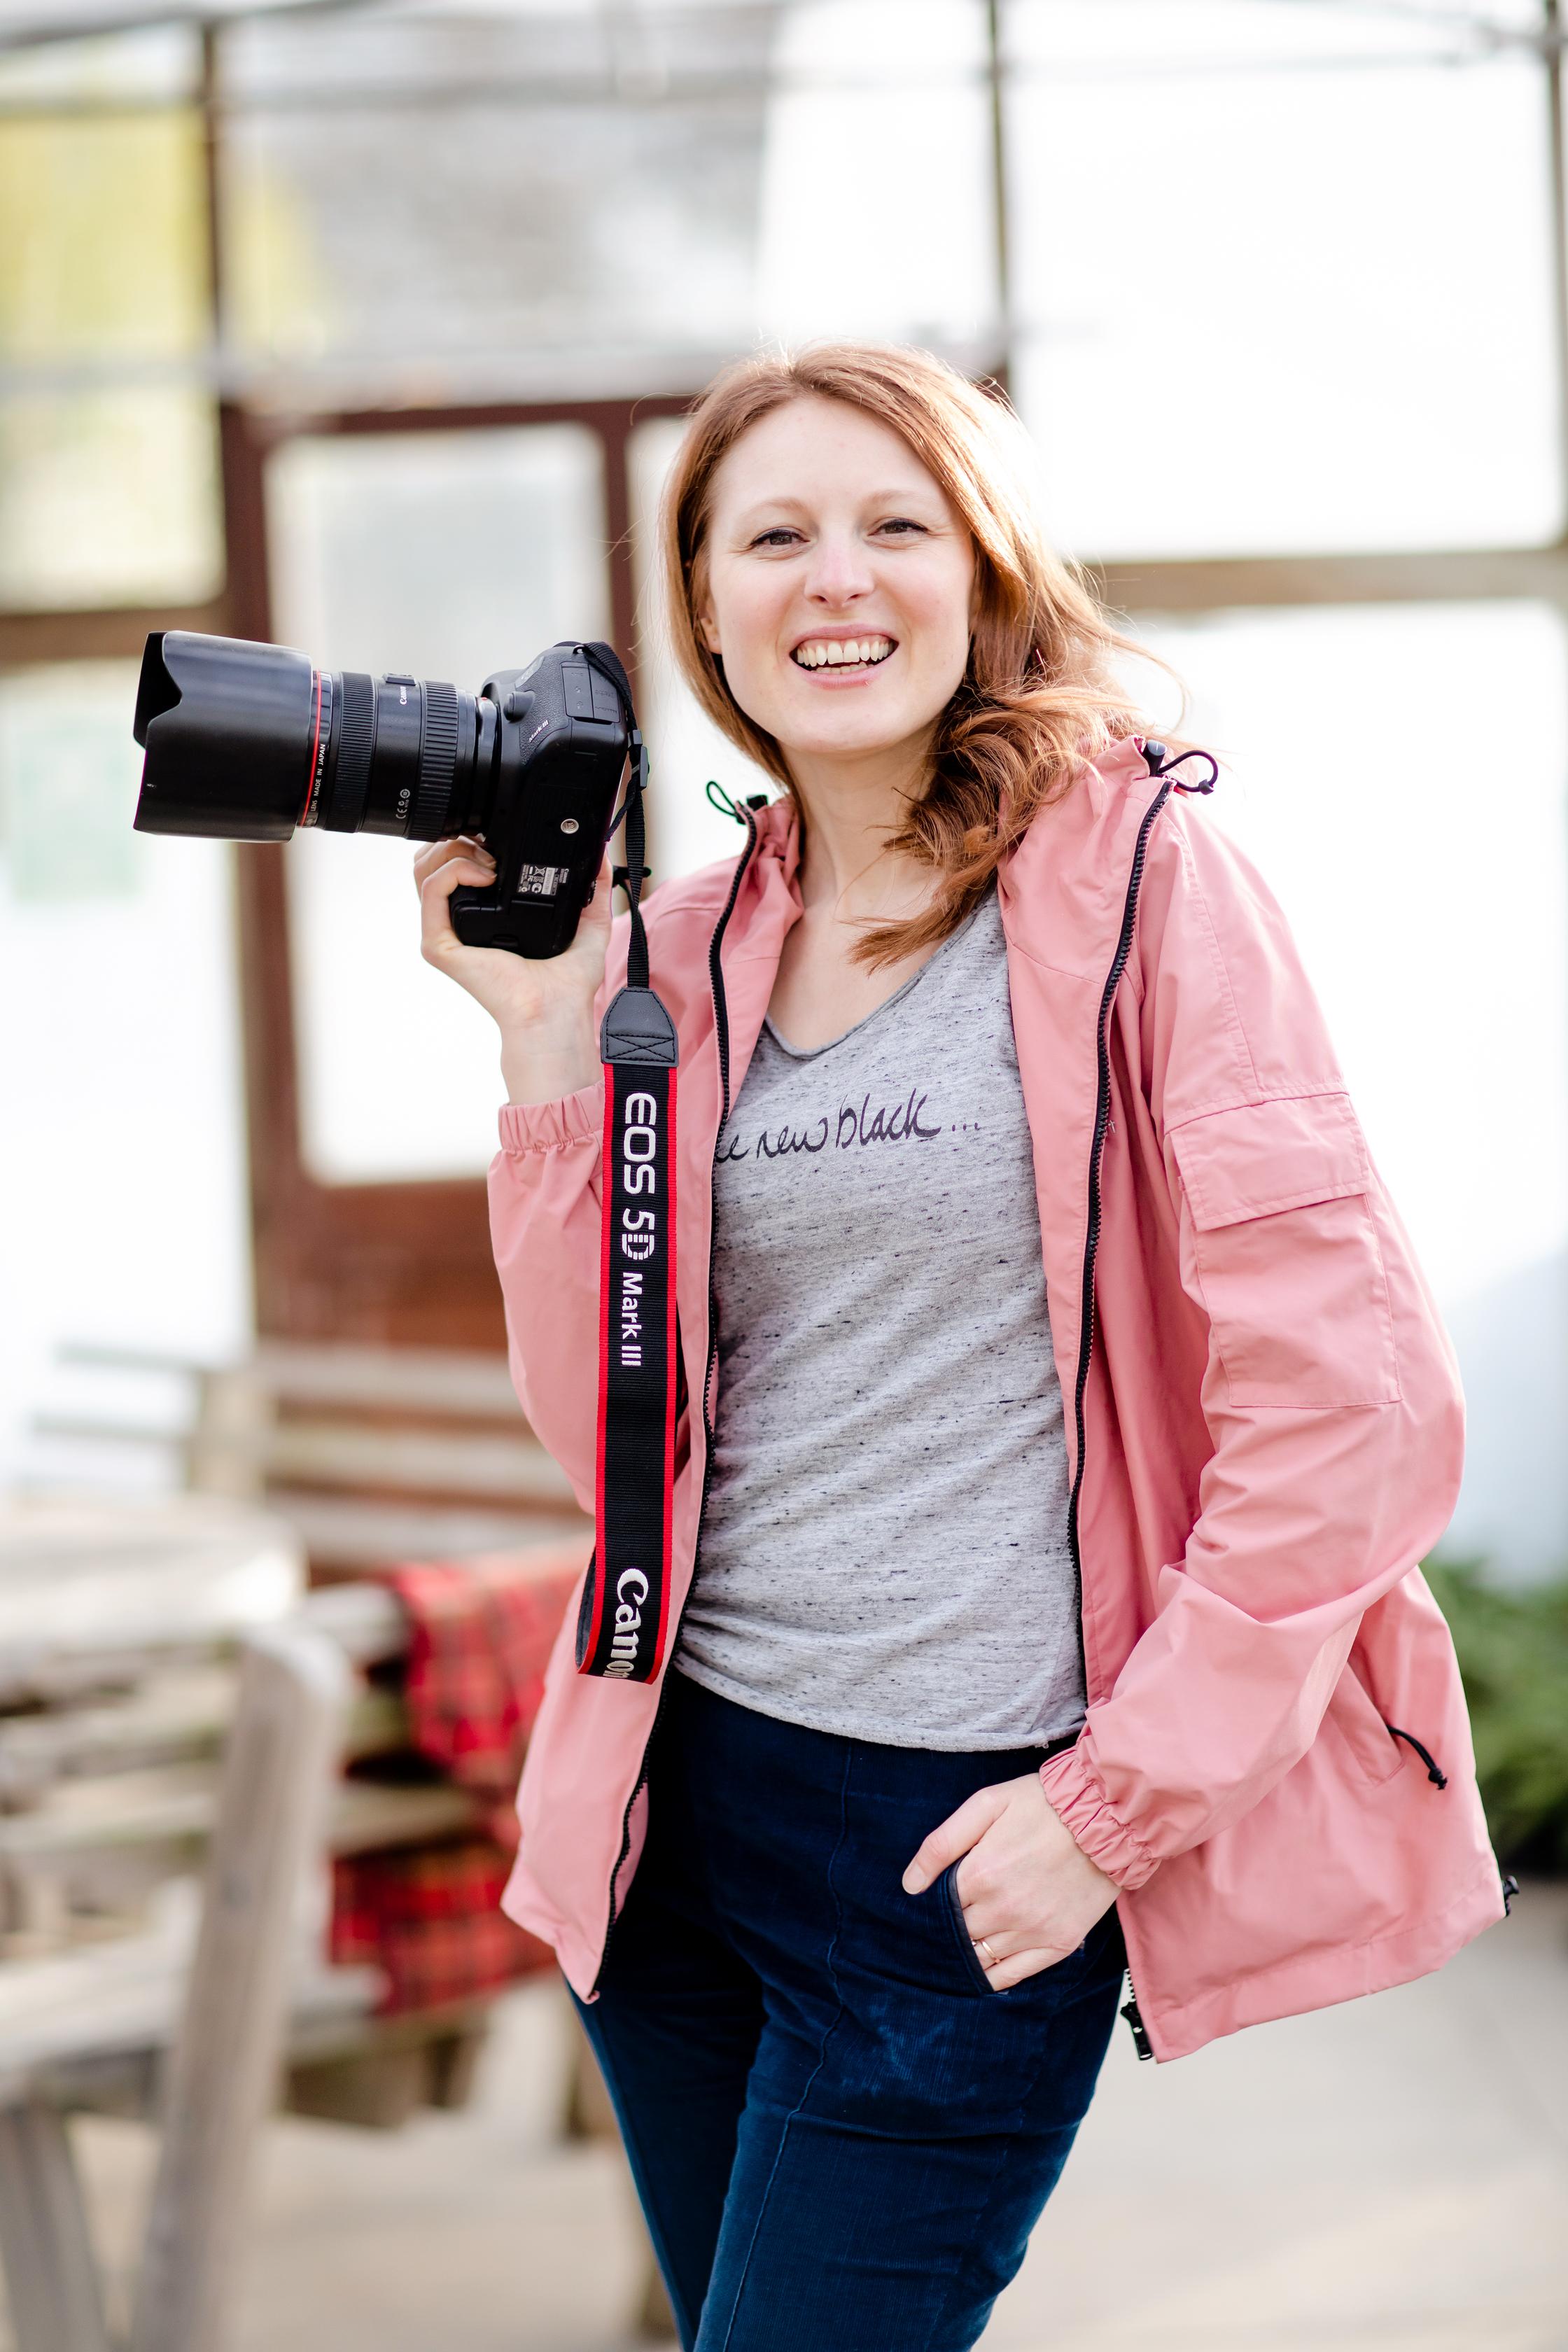 Let me be yourpersonalbrandphotographer -